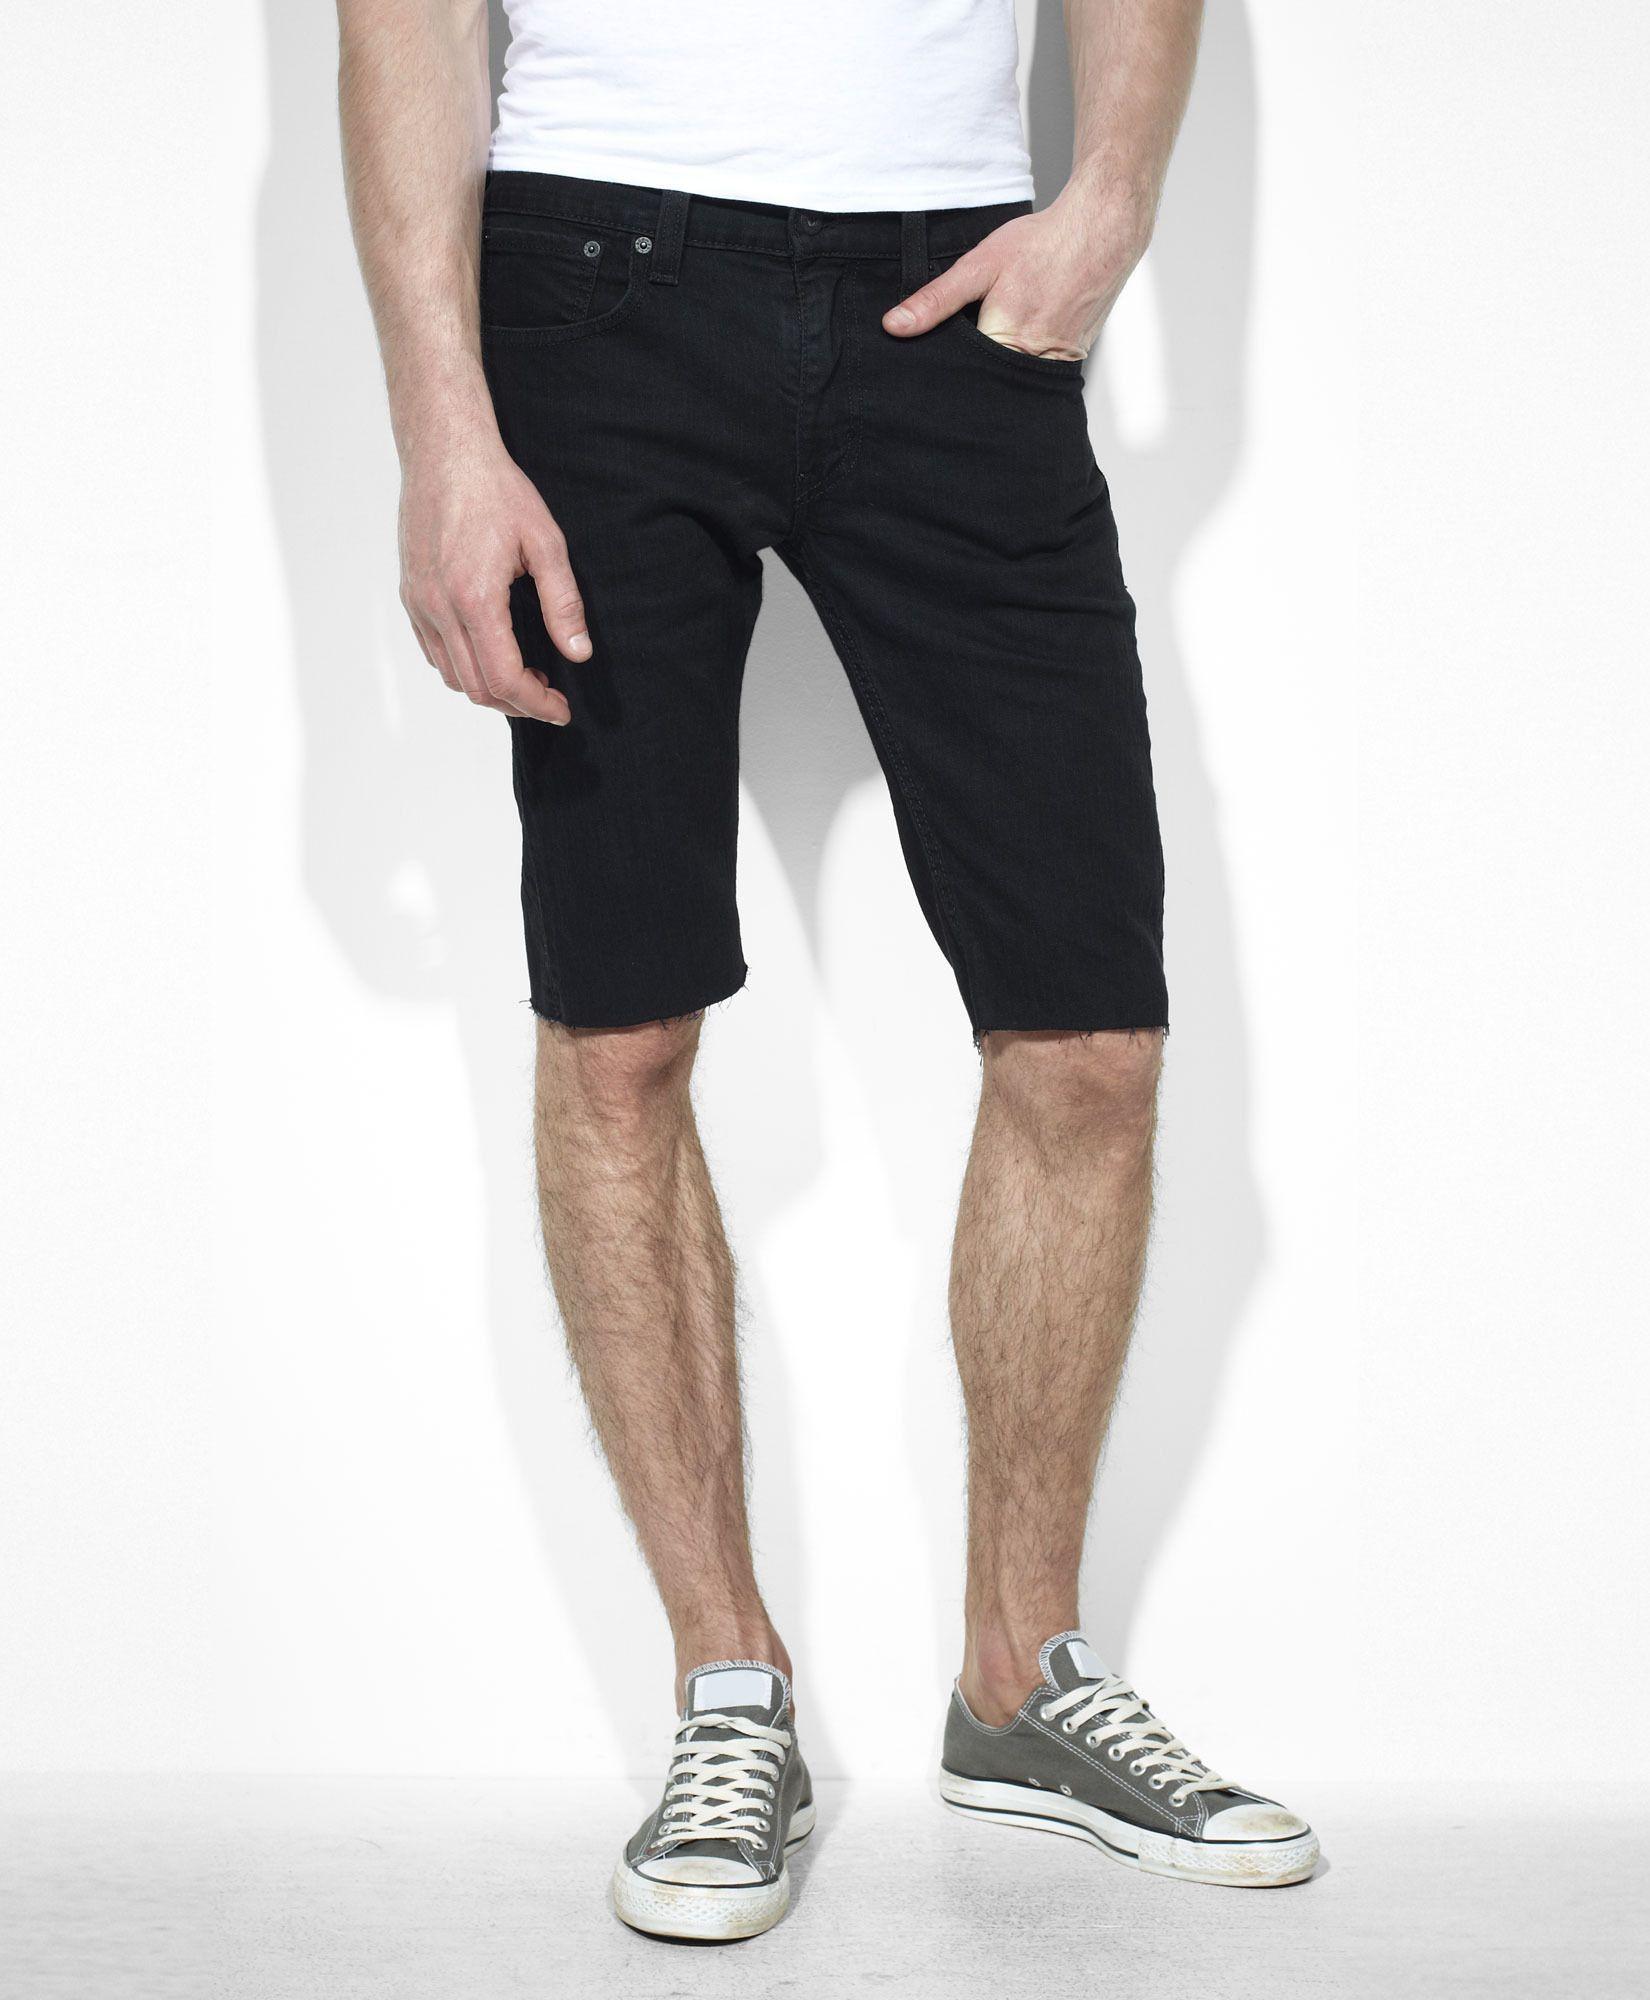 Levi's $55 Skinny Cut-Off Shorts - Black Stretch - Shorts | Men's ...